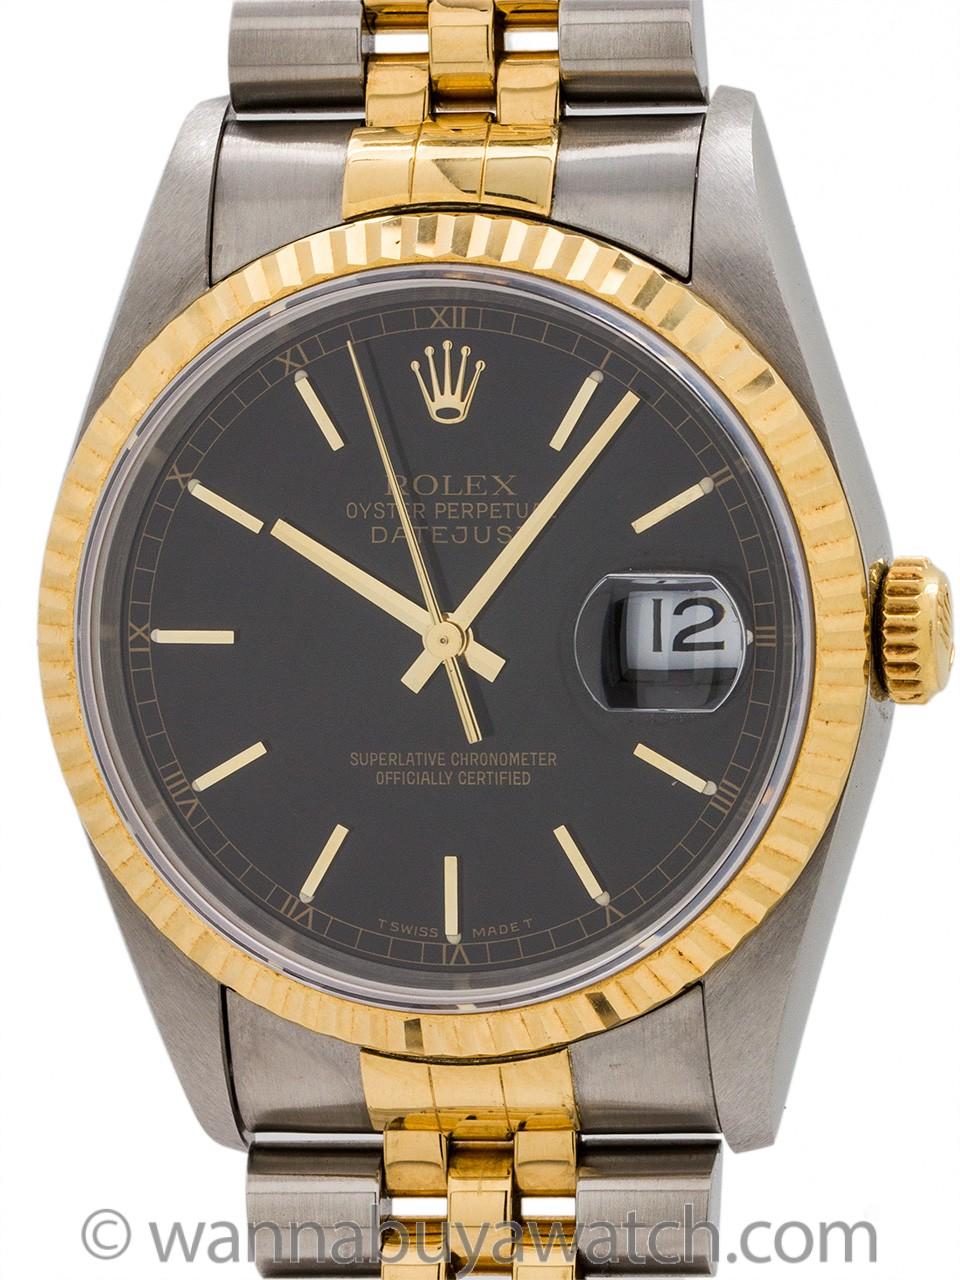 Rolex Datejust ref 16233 SS/18K YG circa 1995